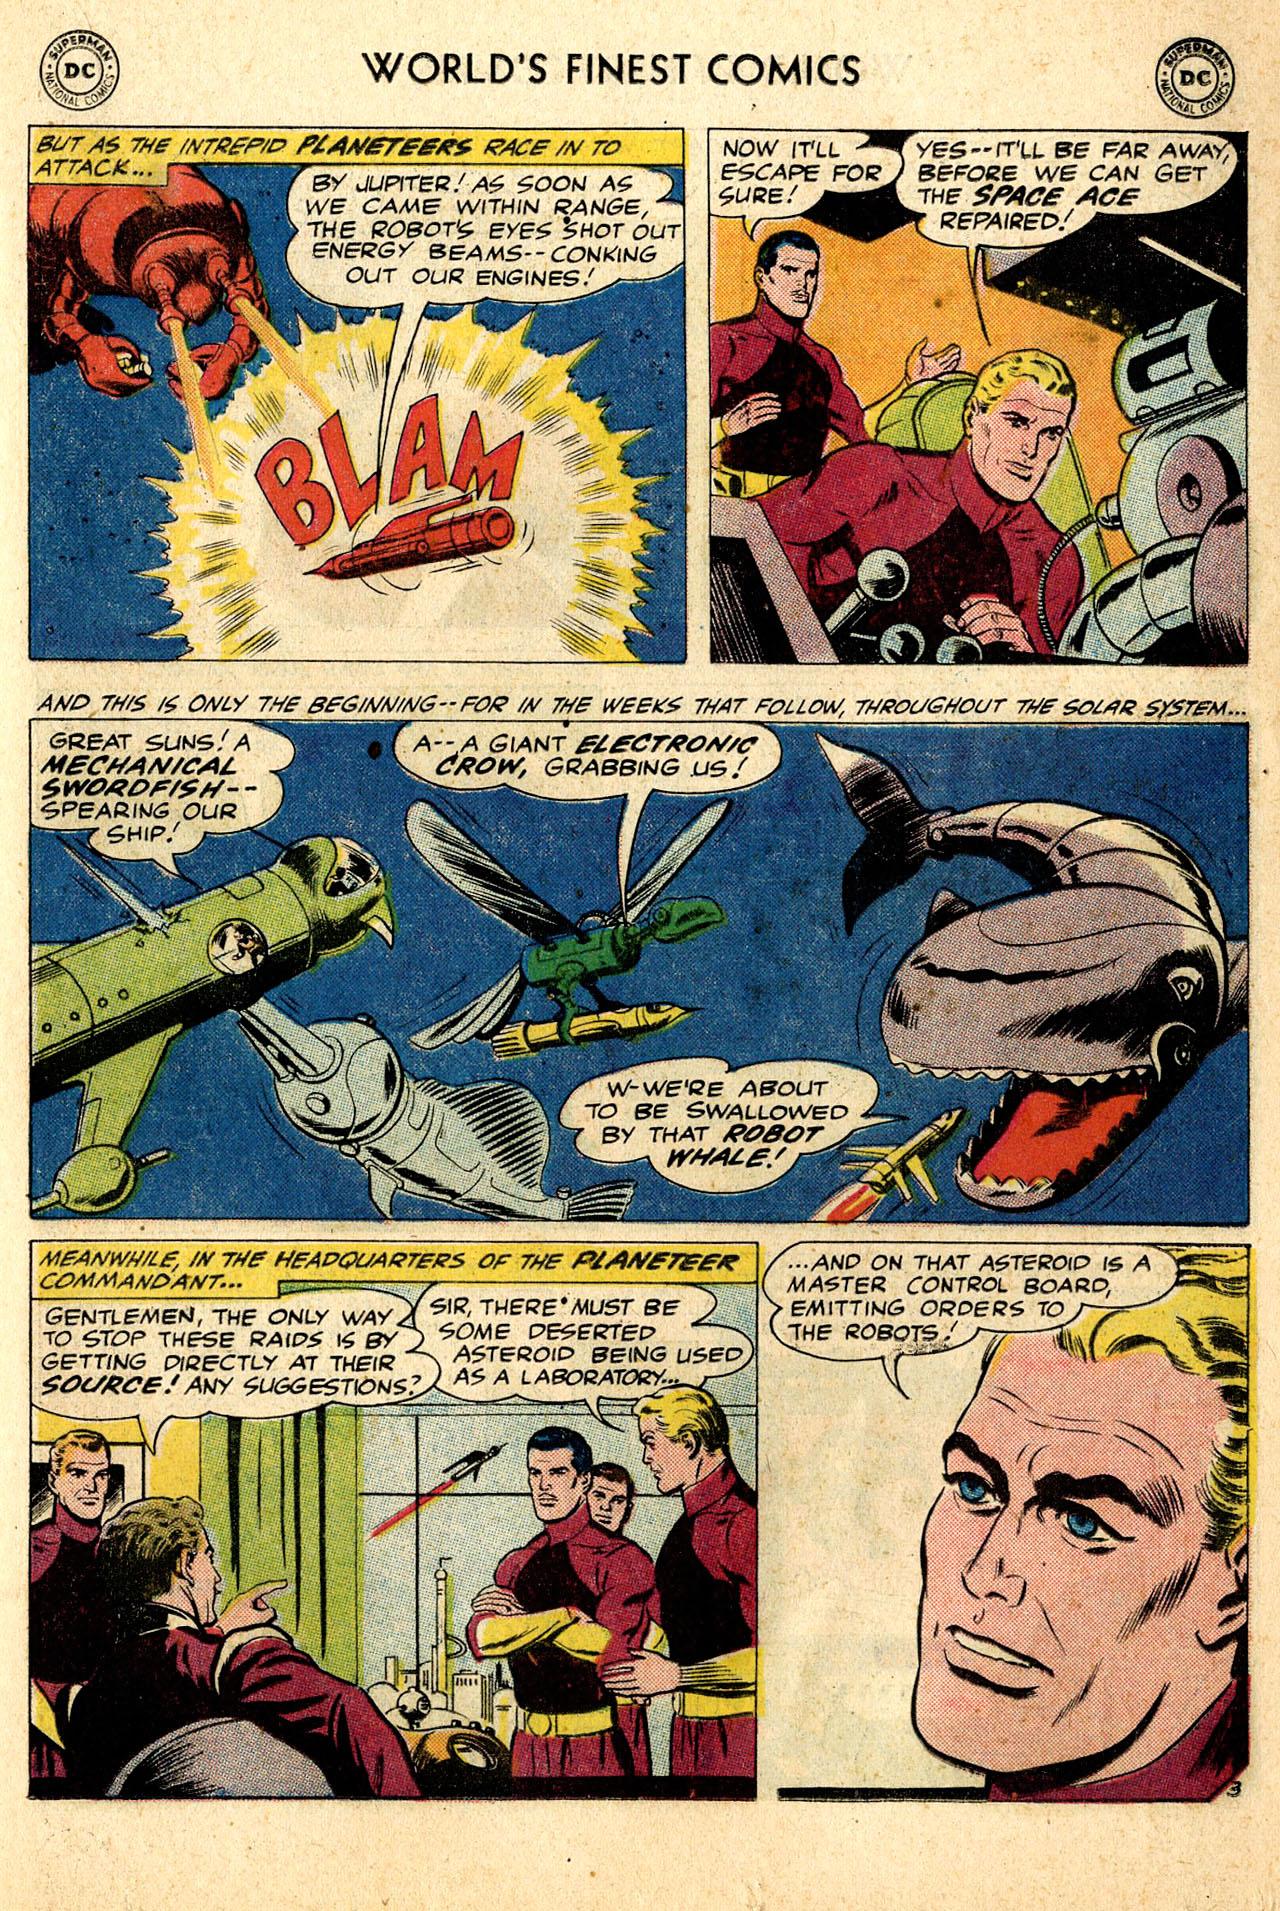 Read online World's Finest Comics comic -  Issue #110 - 19